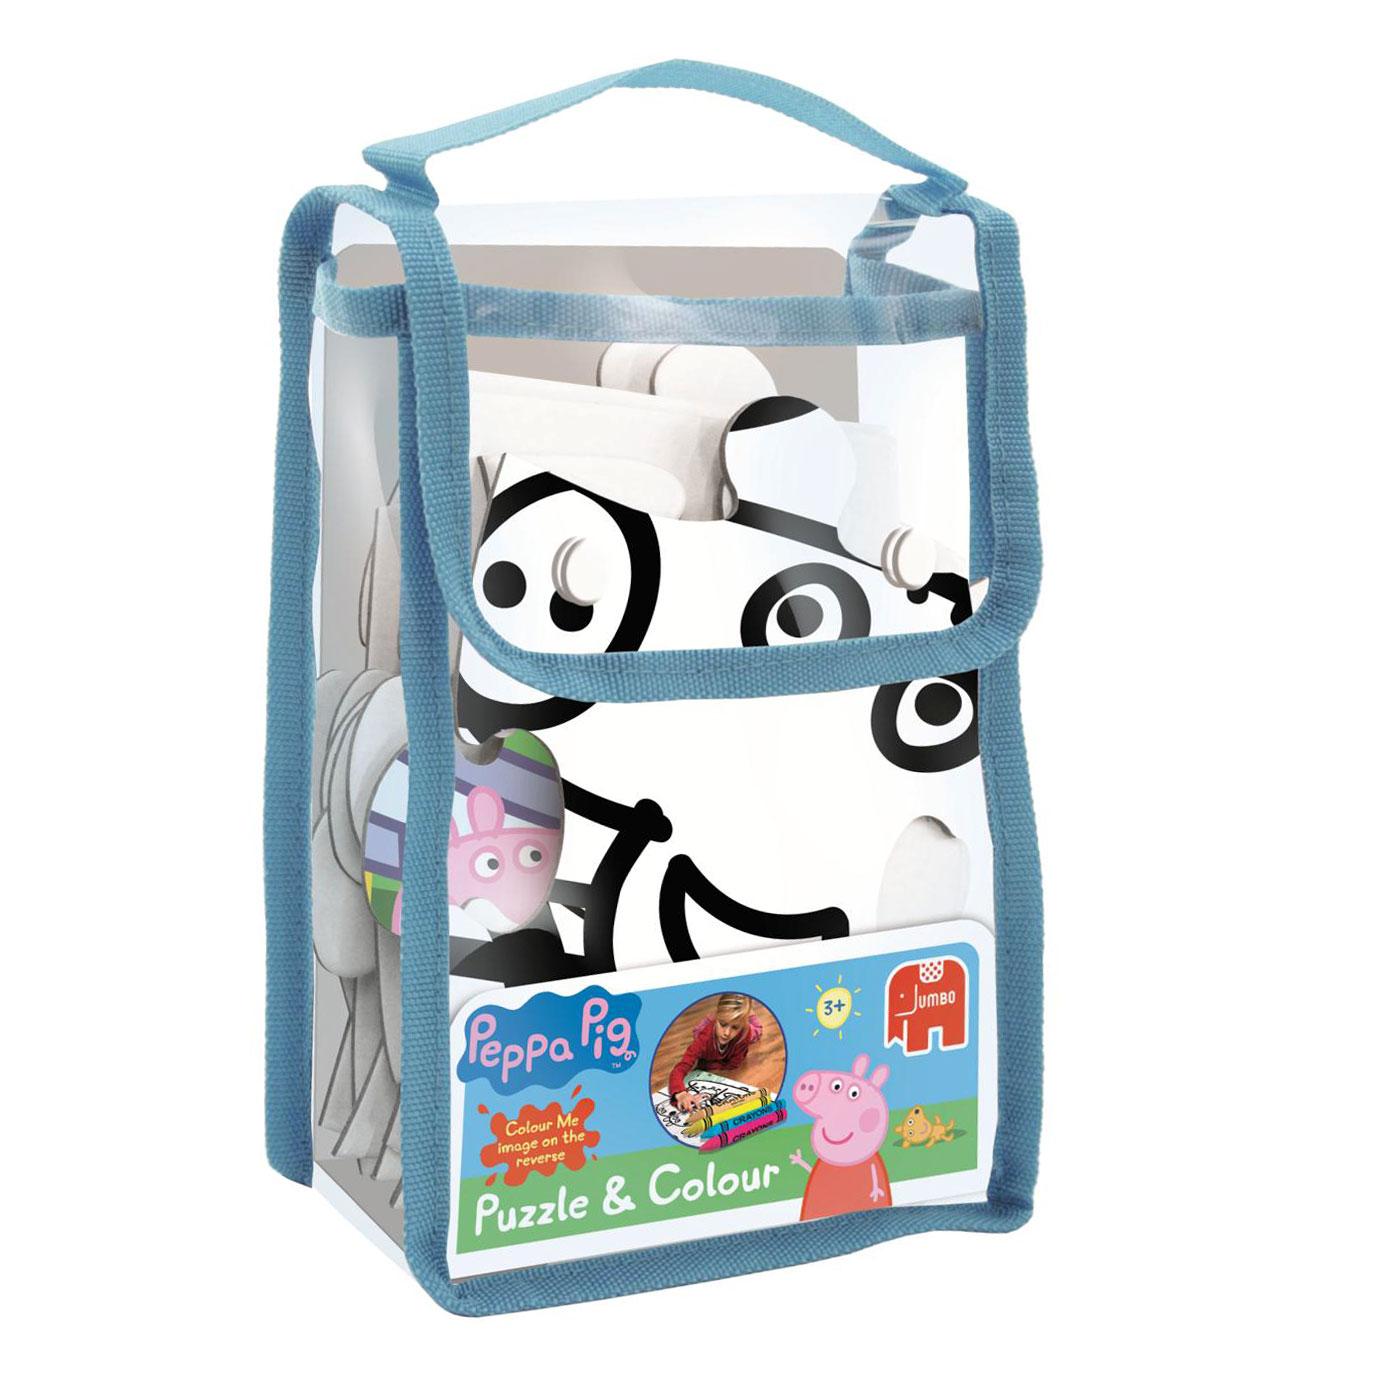 Peppa Pig Puzzel Amp Kleur Online Kopen Lobbes Nl